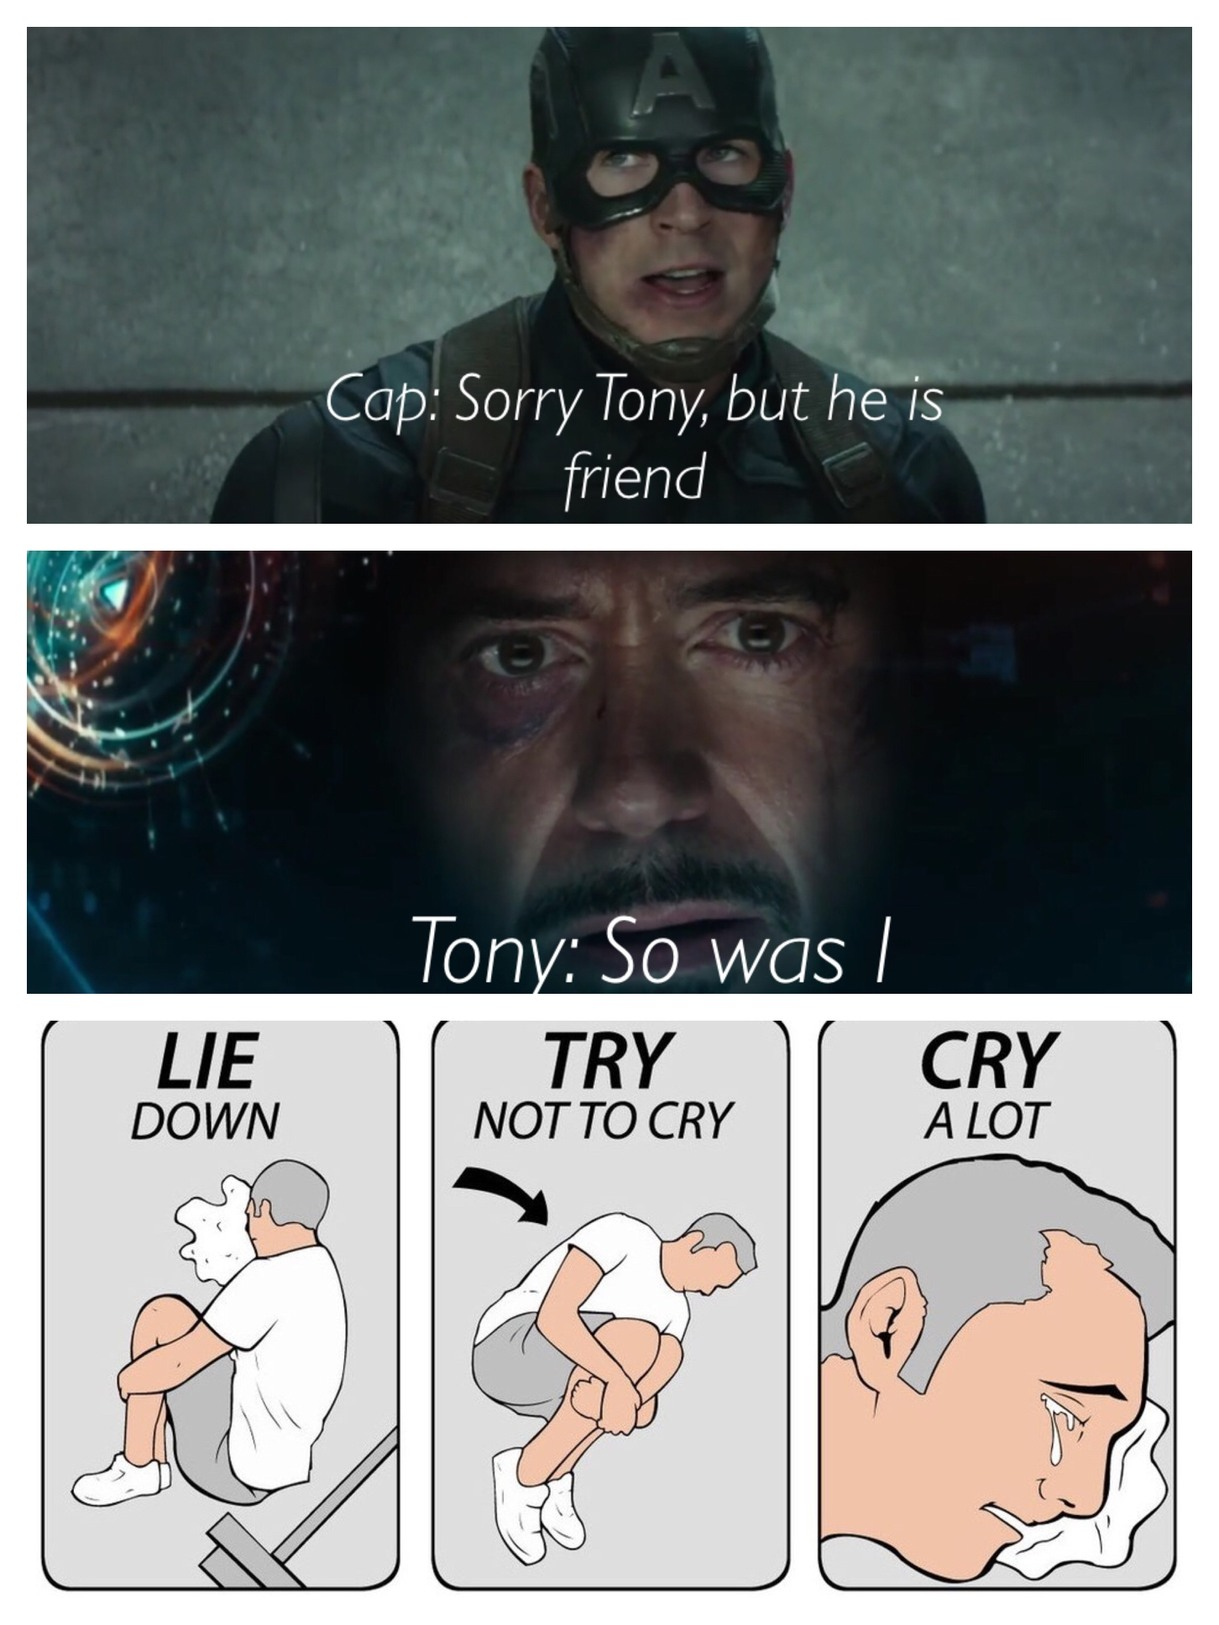 Even dank memes can't make me happy